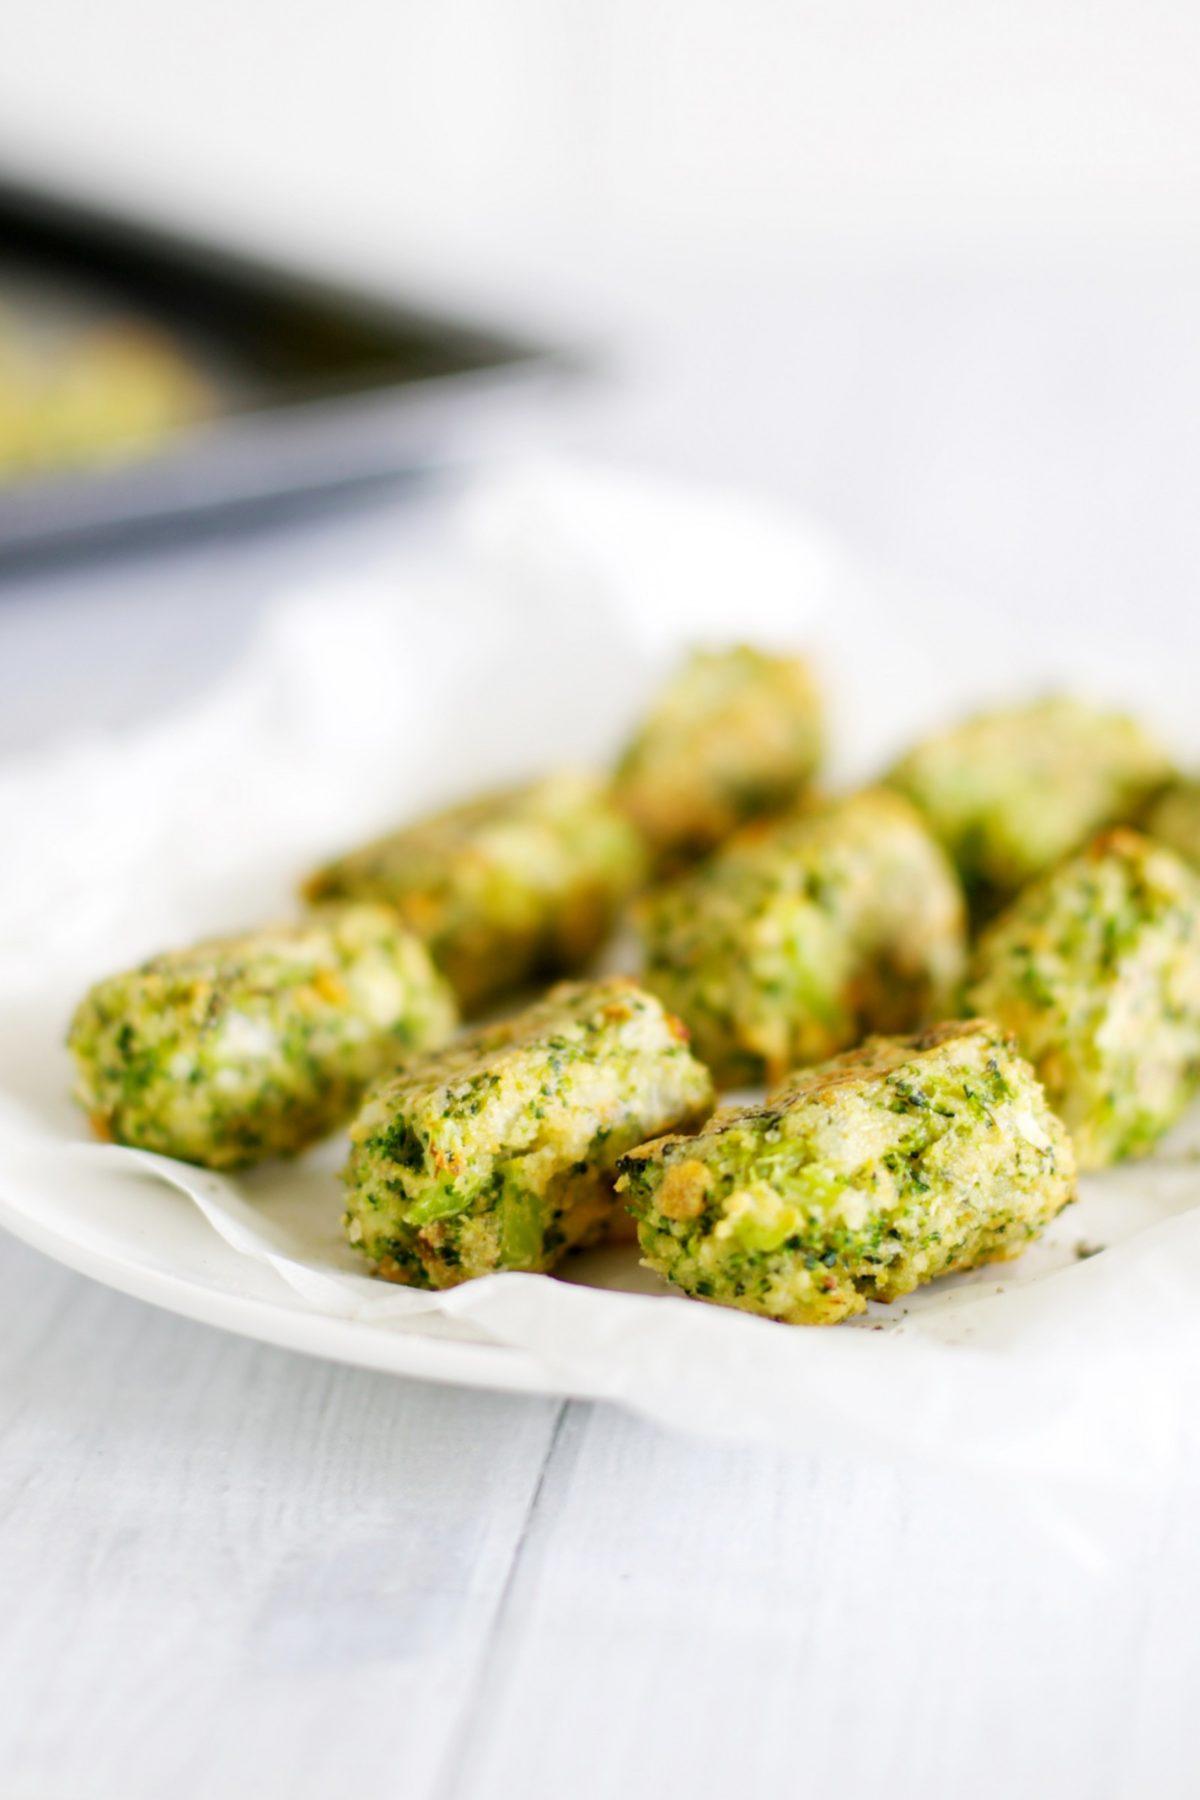 Broccoli tots (with cheddar)